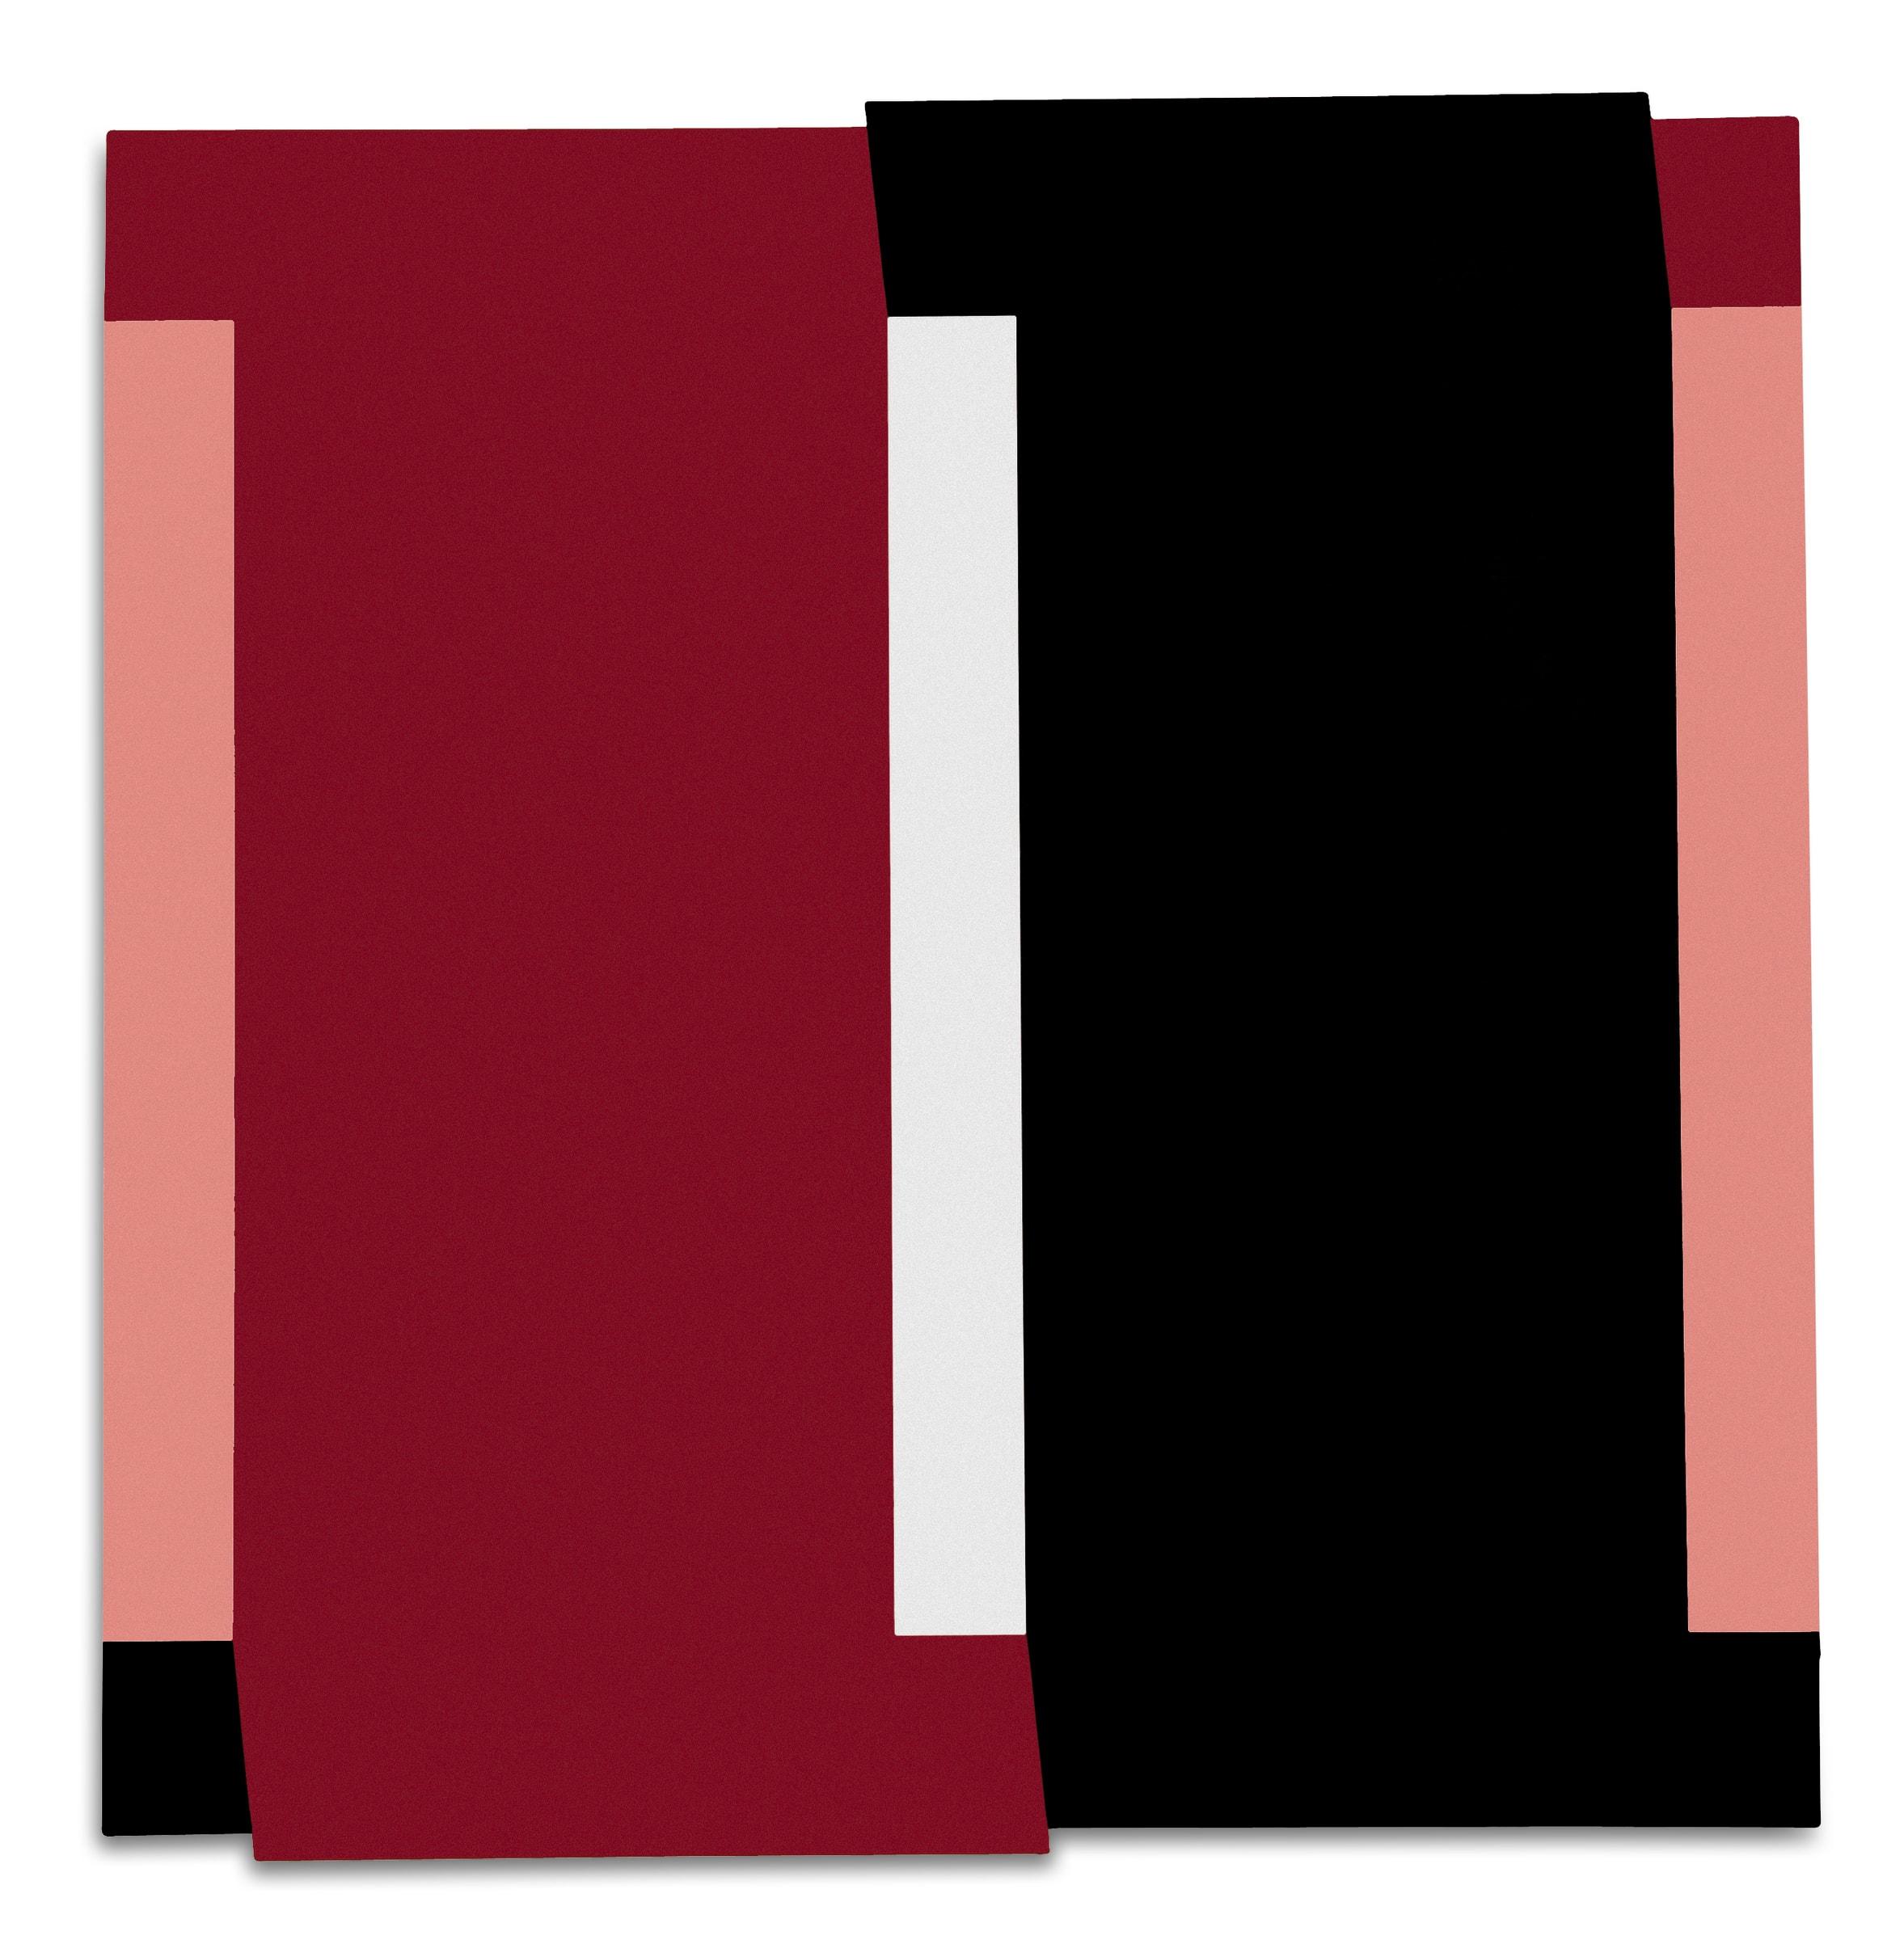 "<span class=""link fancybox-details-link""><a href=""/artists/30-giuliano-barbanti/works/319-giuliano-barbanti-interferenze-834-2001/"">View Detail Page</a></span><div class=""artist""><strong>Giuliano Barbanti</strong></div> <div class=""title""><em>Interferenze 834</em>, 2001</div> <div class=""medium"">acrilico su tela</div> <div class=""dimensions"">cm 82,5 x 80</div>"